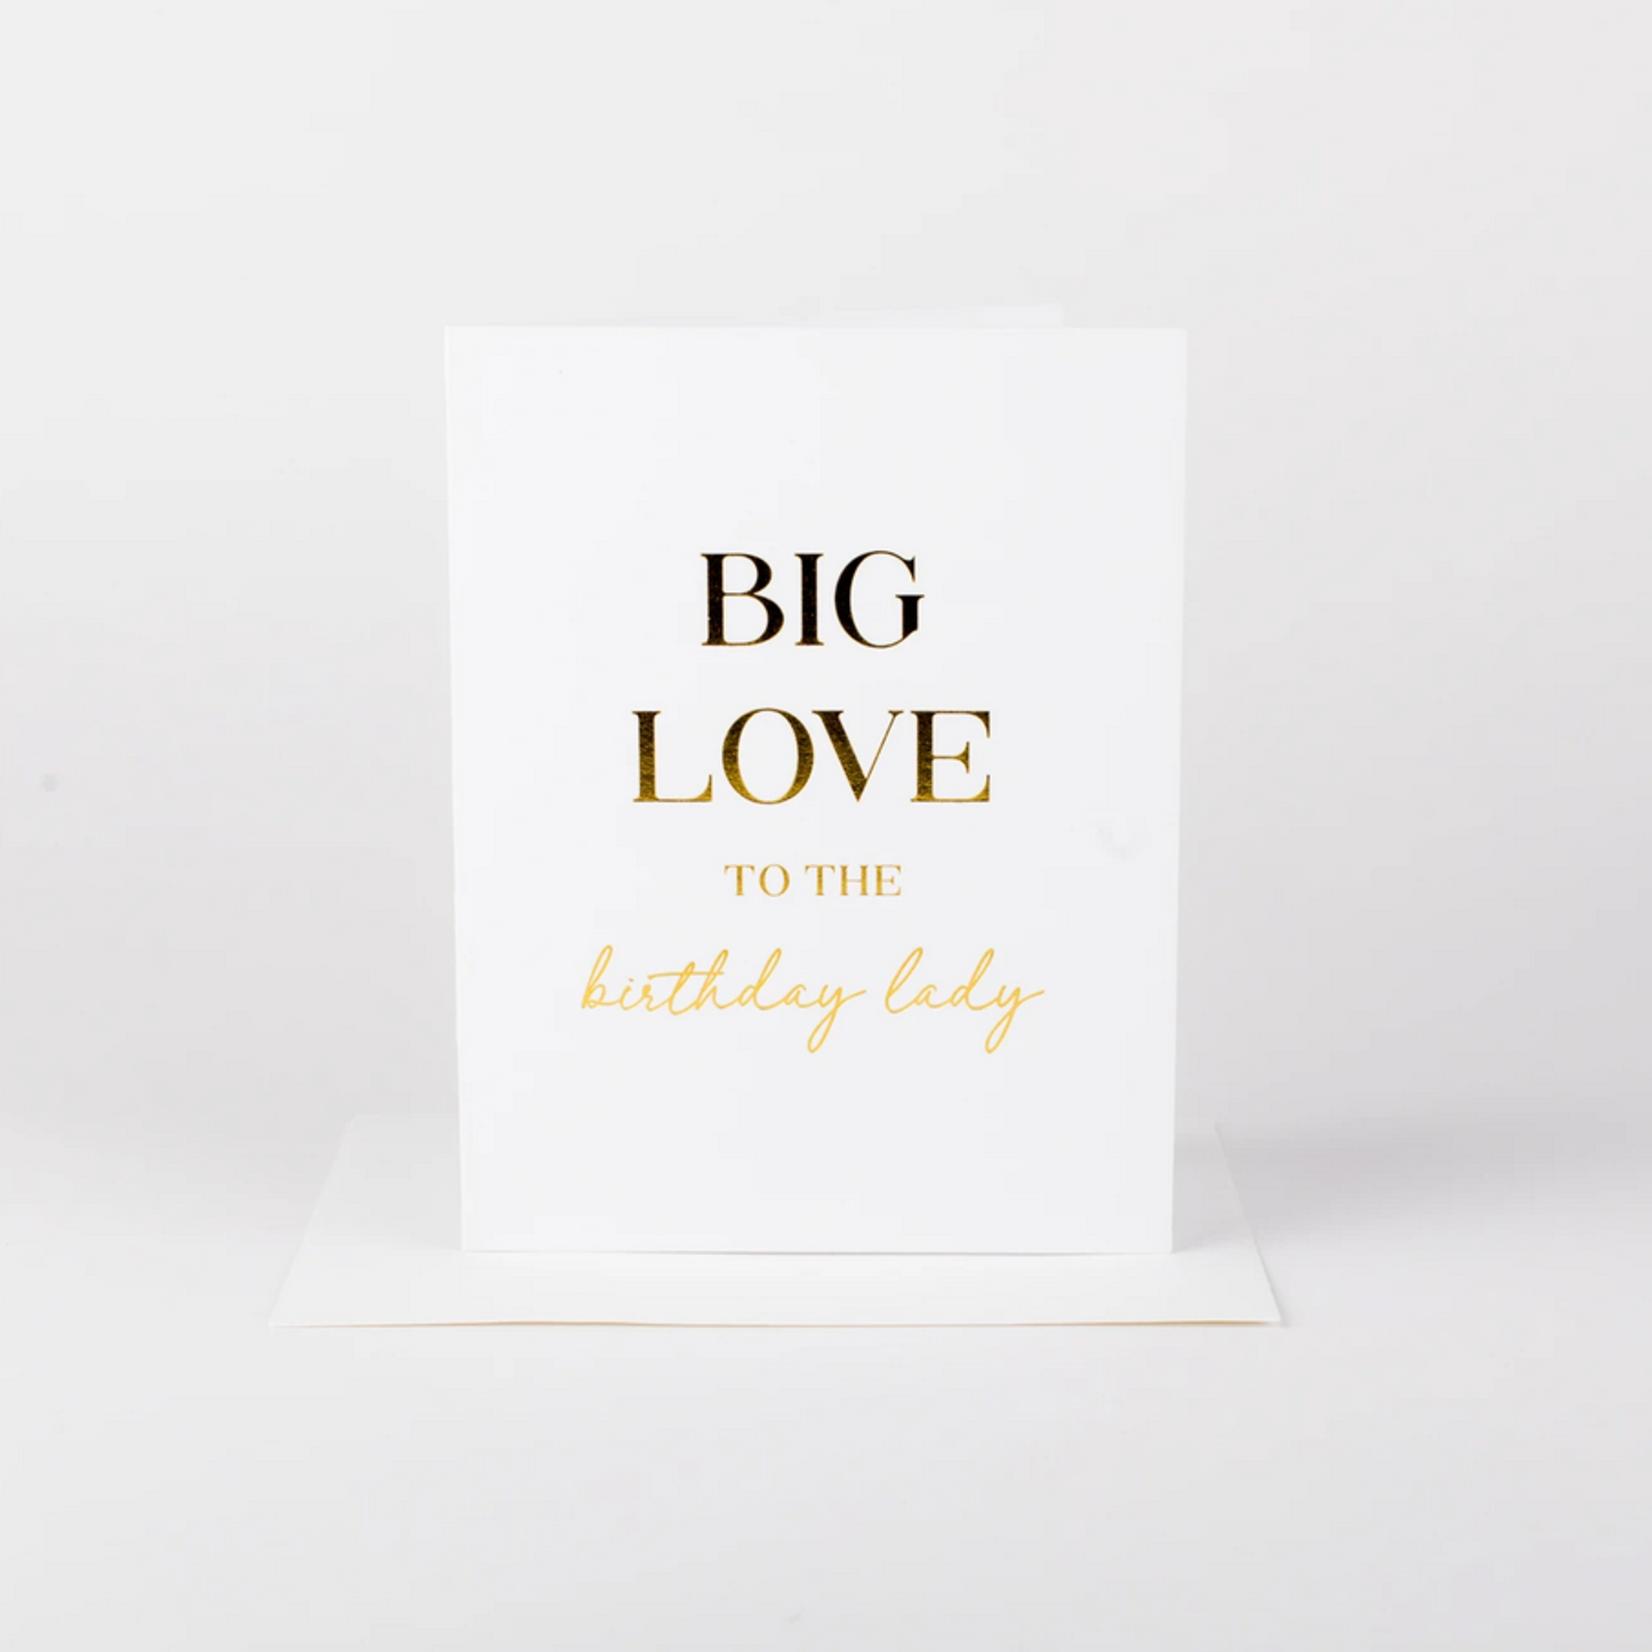 Wrinkle and Crease Big Love, Birthday Lady card